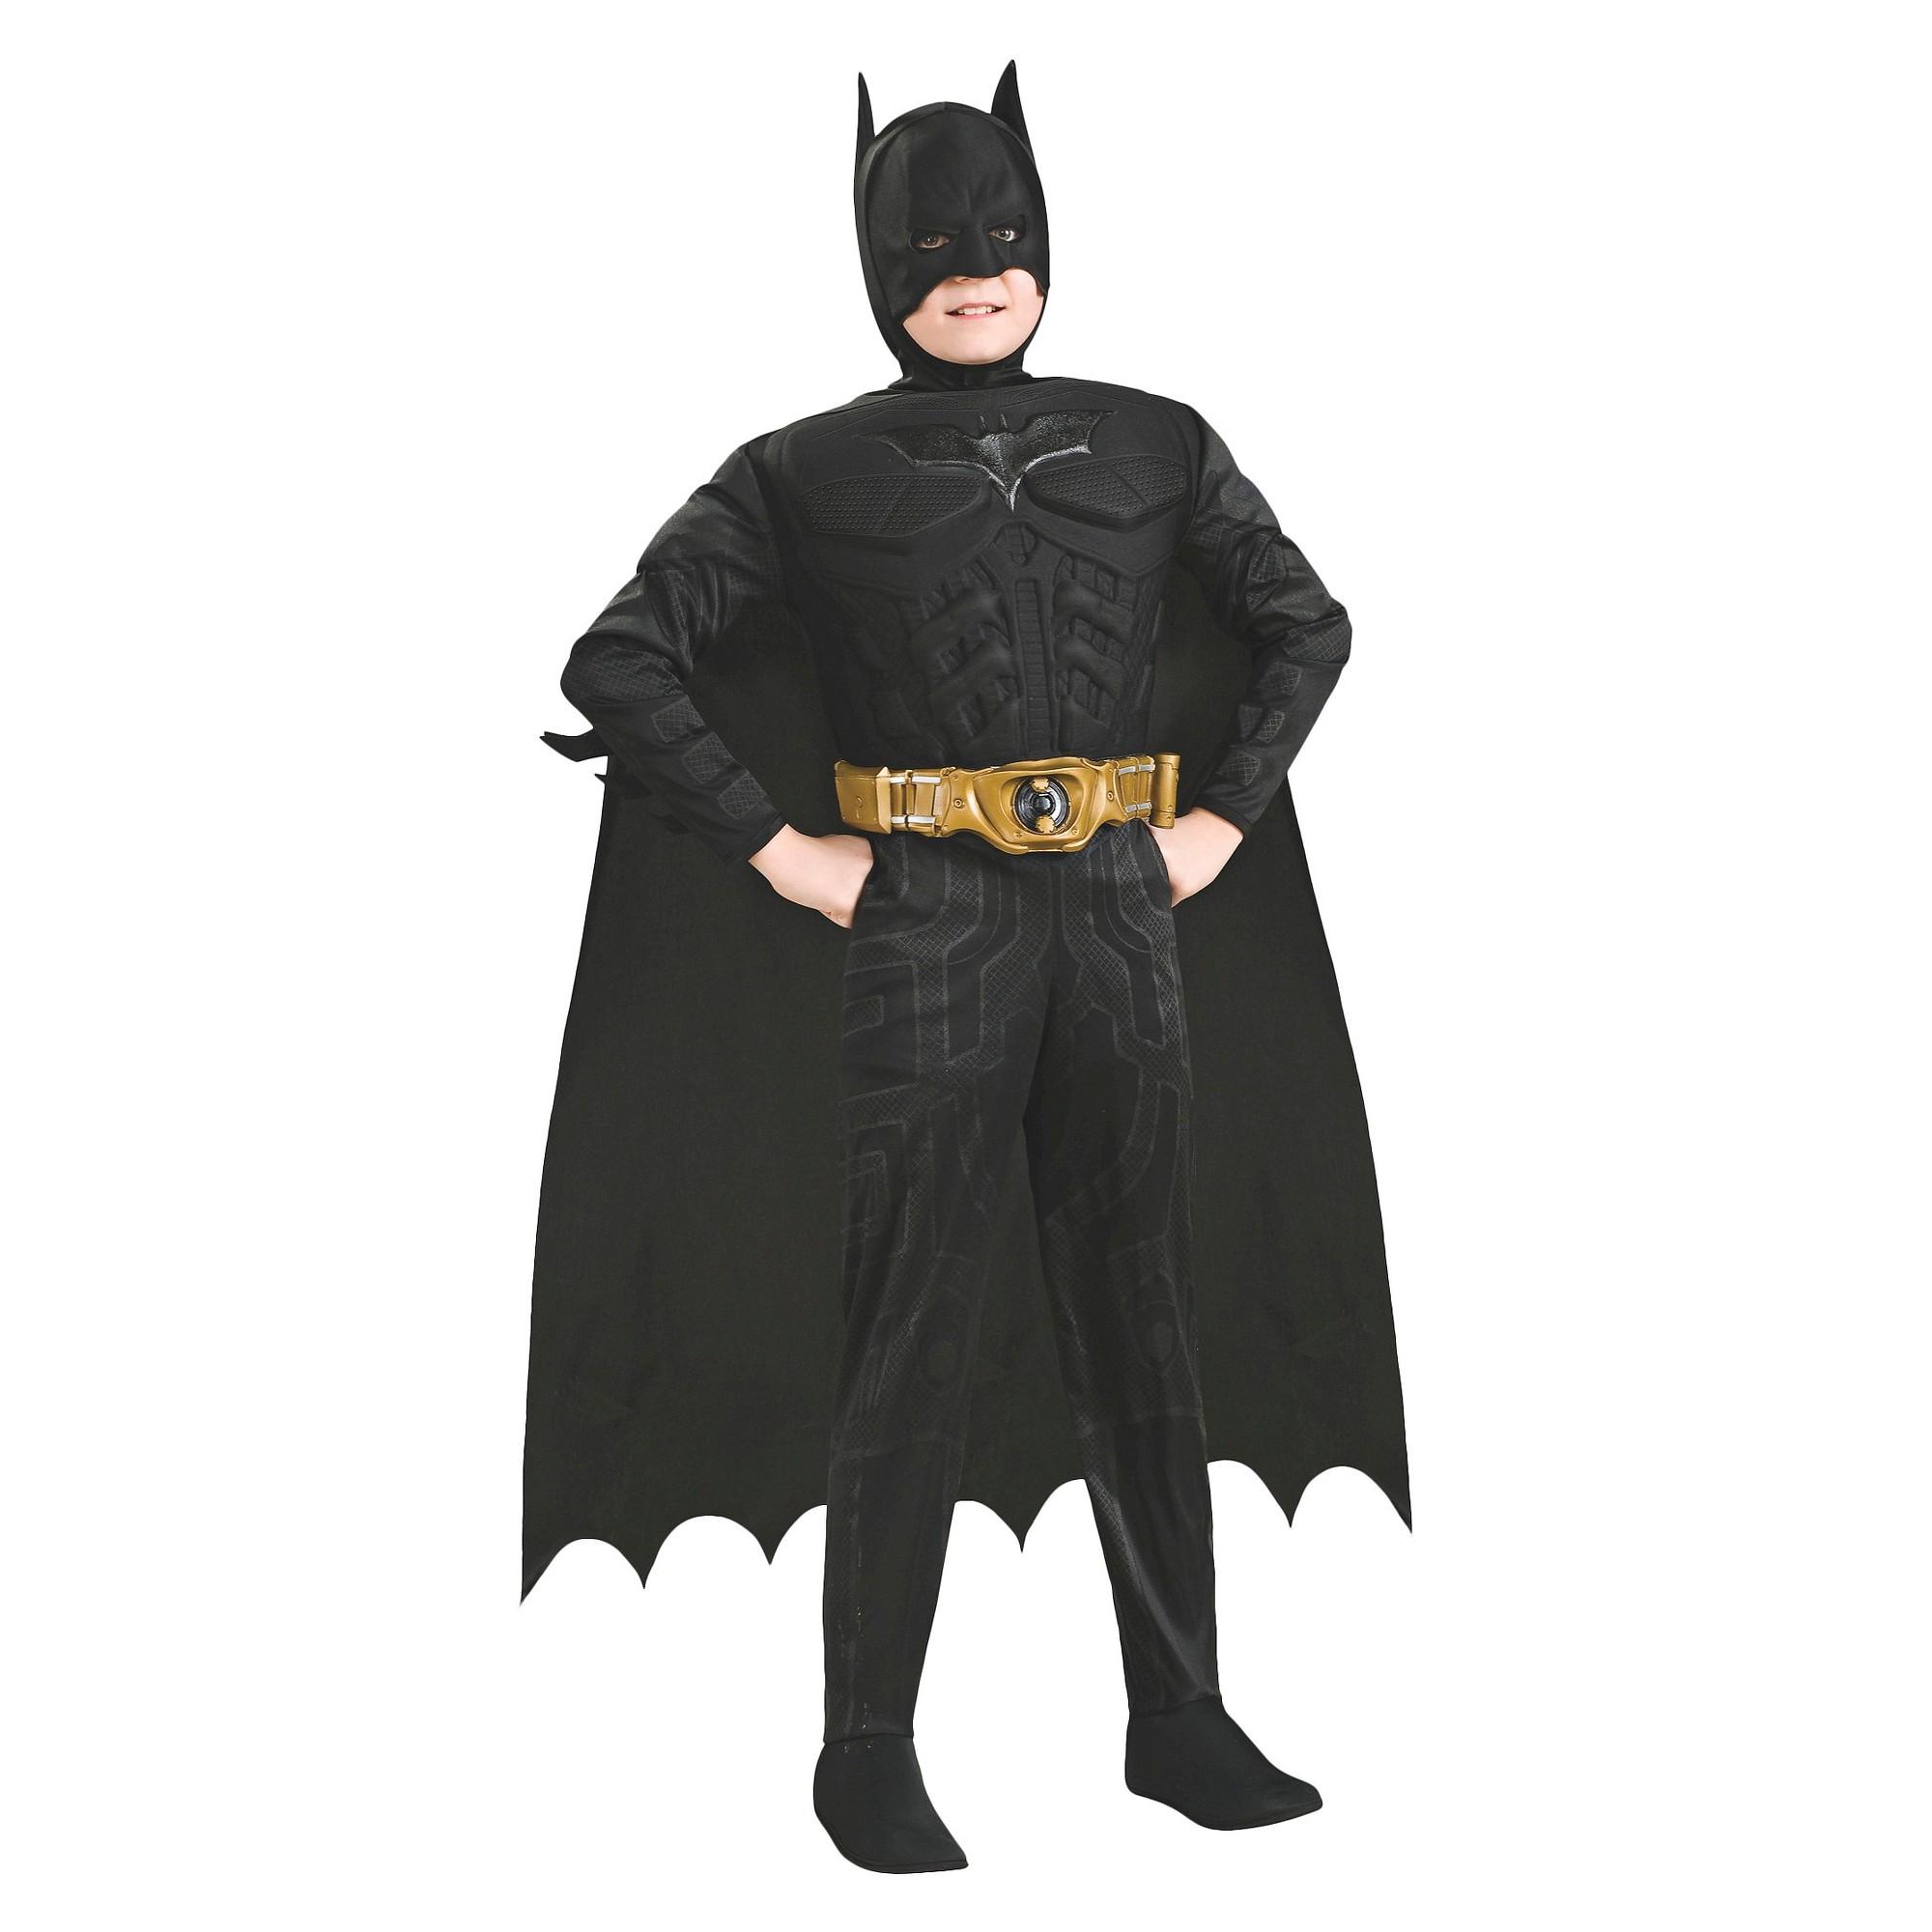 Halloween Boys' Batman The Dark Knight Rises Costume - M (7-8), Boy's, Size: Medium, Clear